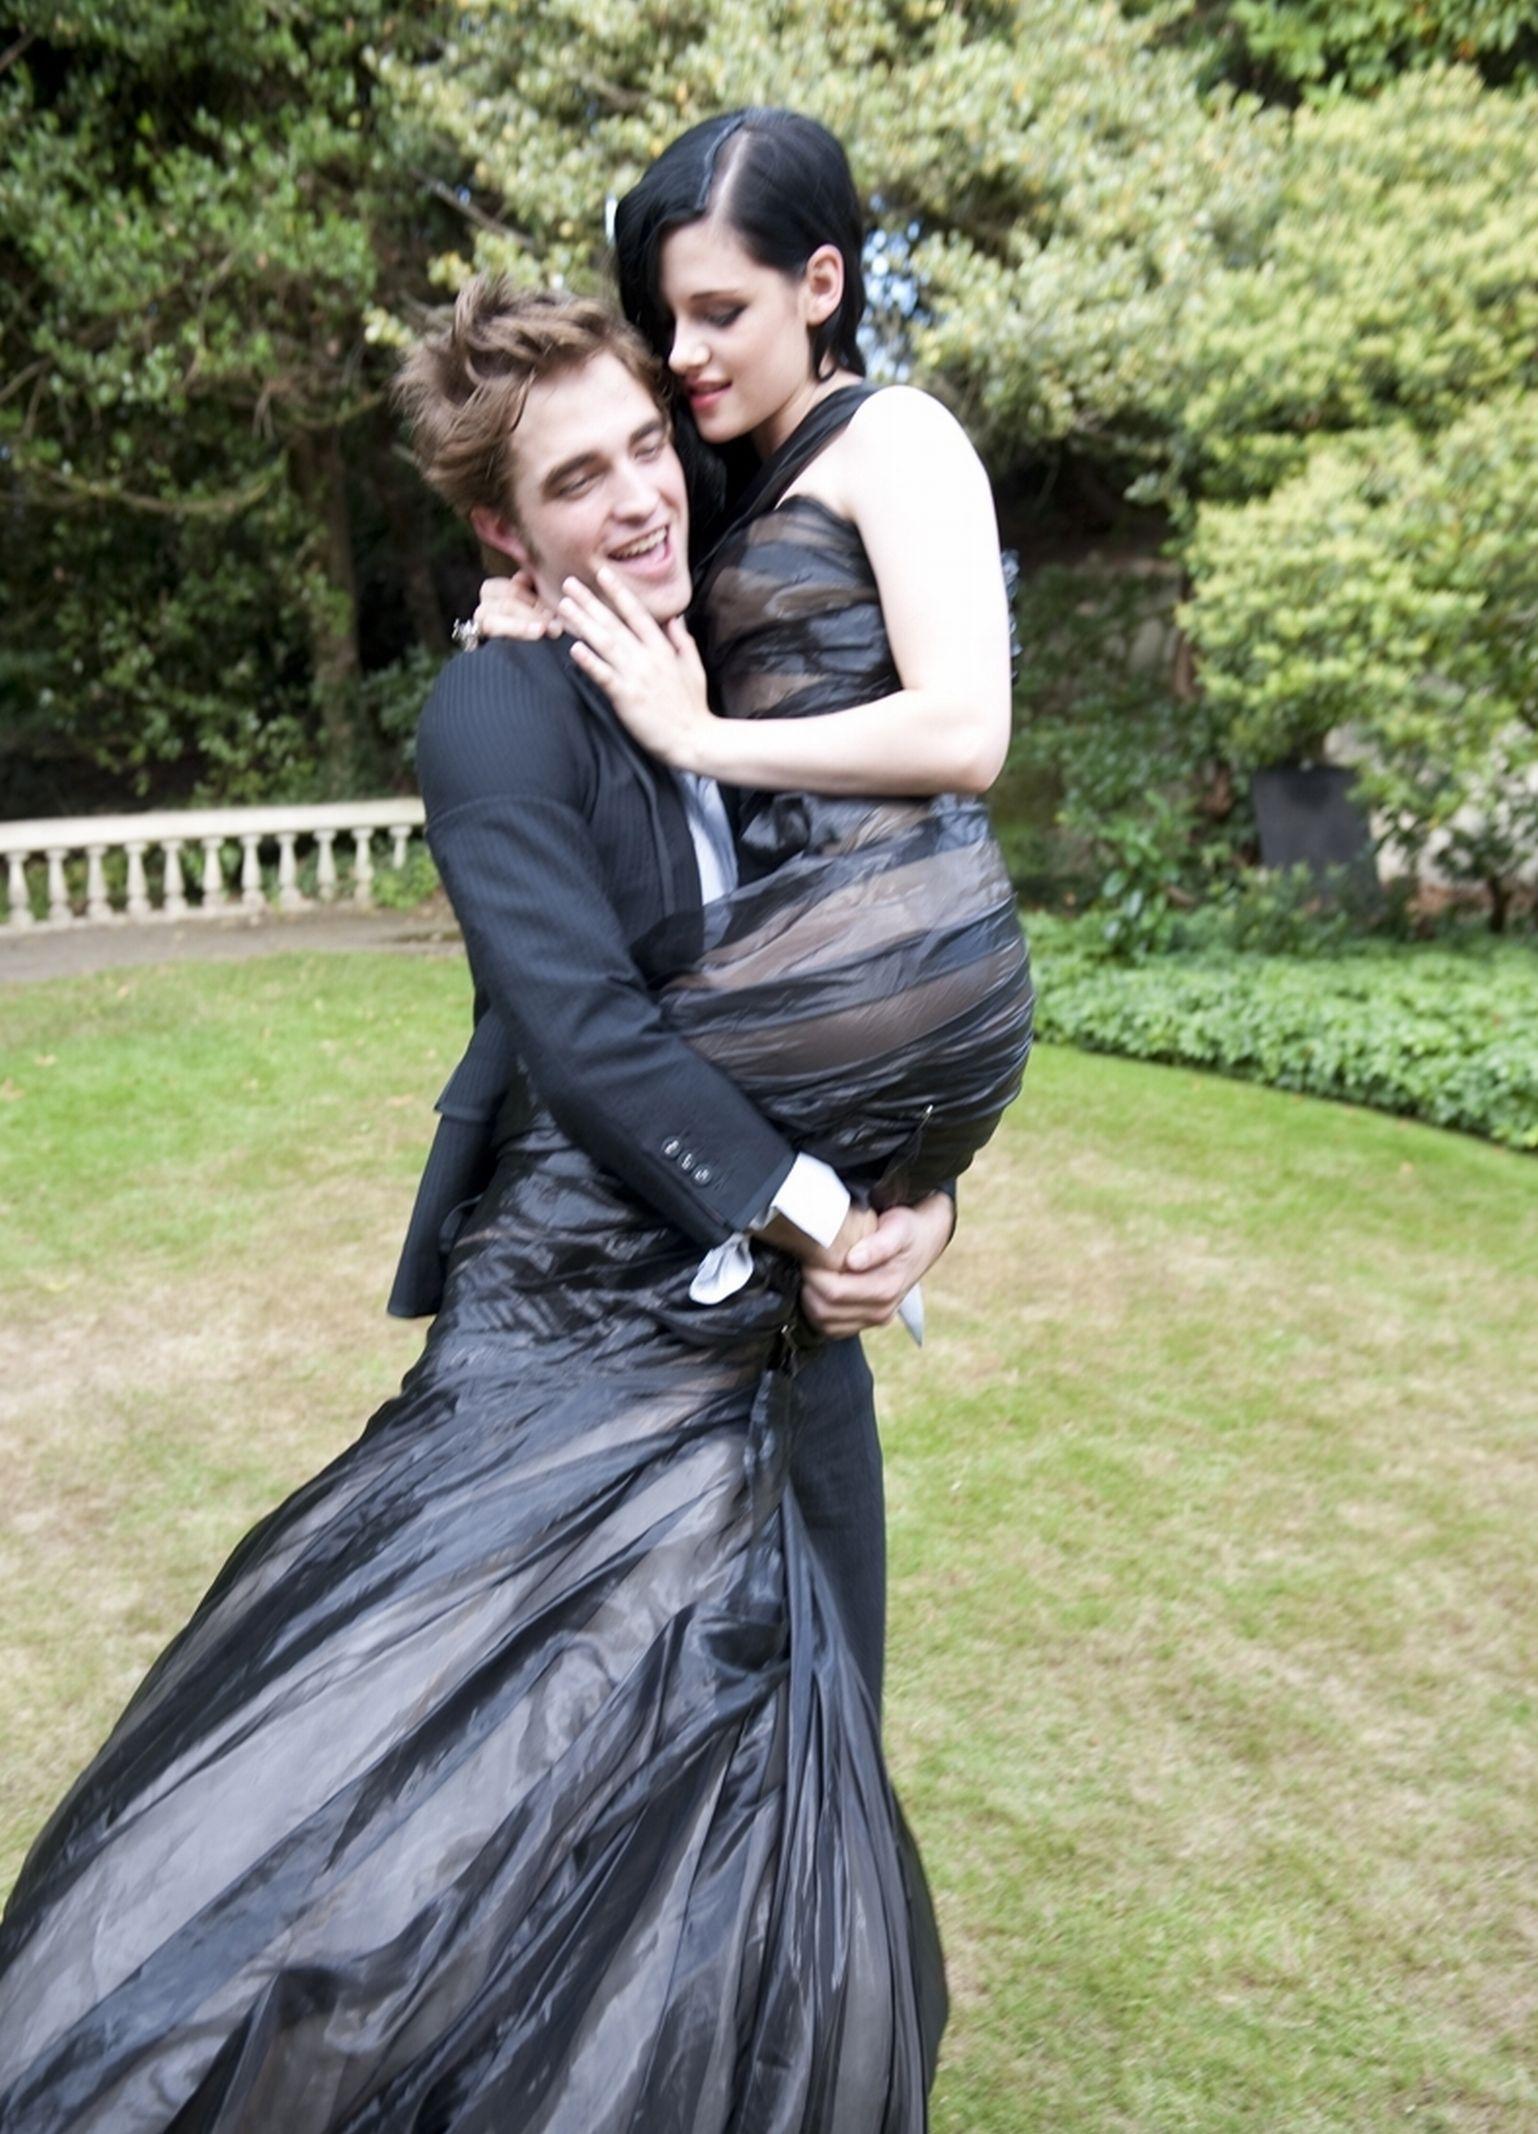 Harper S Bazaar Robert Pattinson And Kristen Robert Pattinson Twilight Kristen Stewart [ 2134 x 1538 Pixel ]